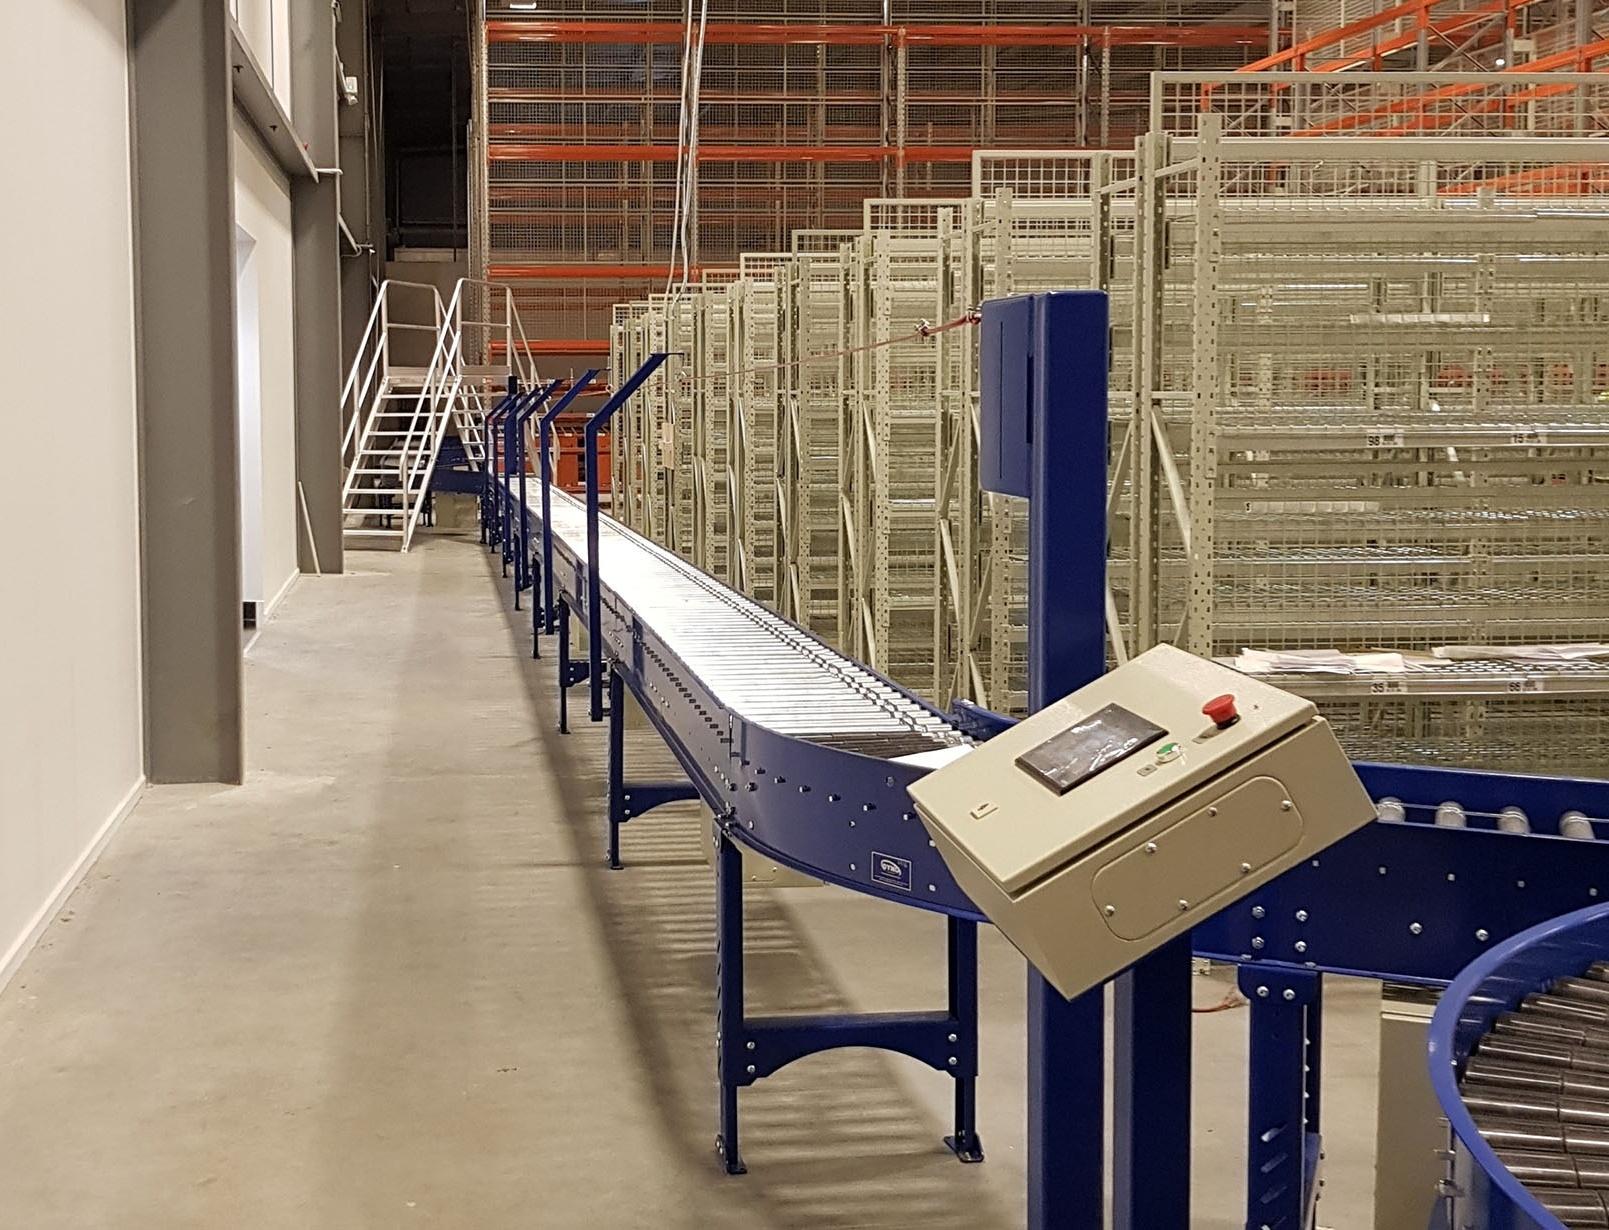 Dyno_Onelink_Warehouse Conveyor (8)-340774-edited